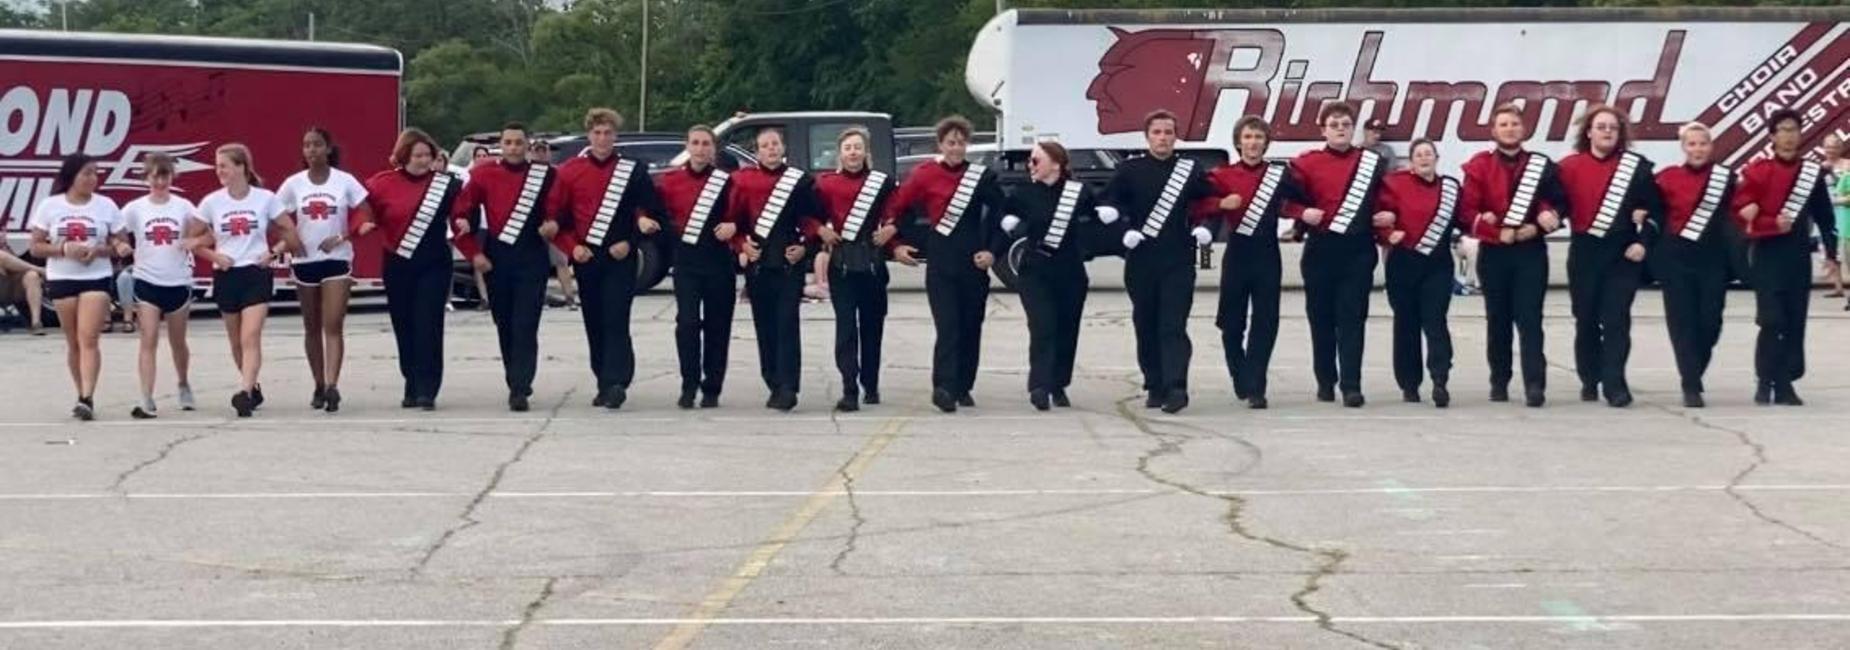 RHS Marching Band SENIORS